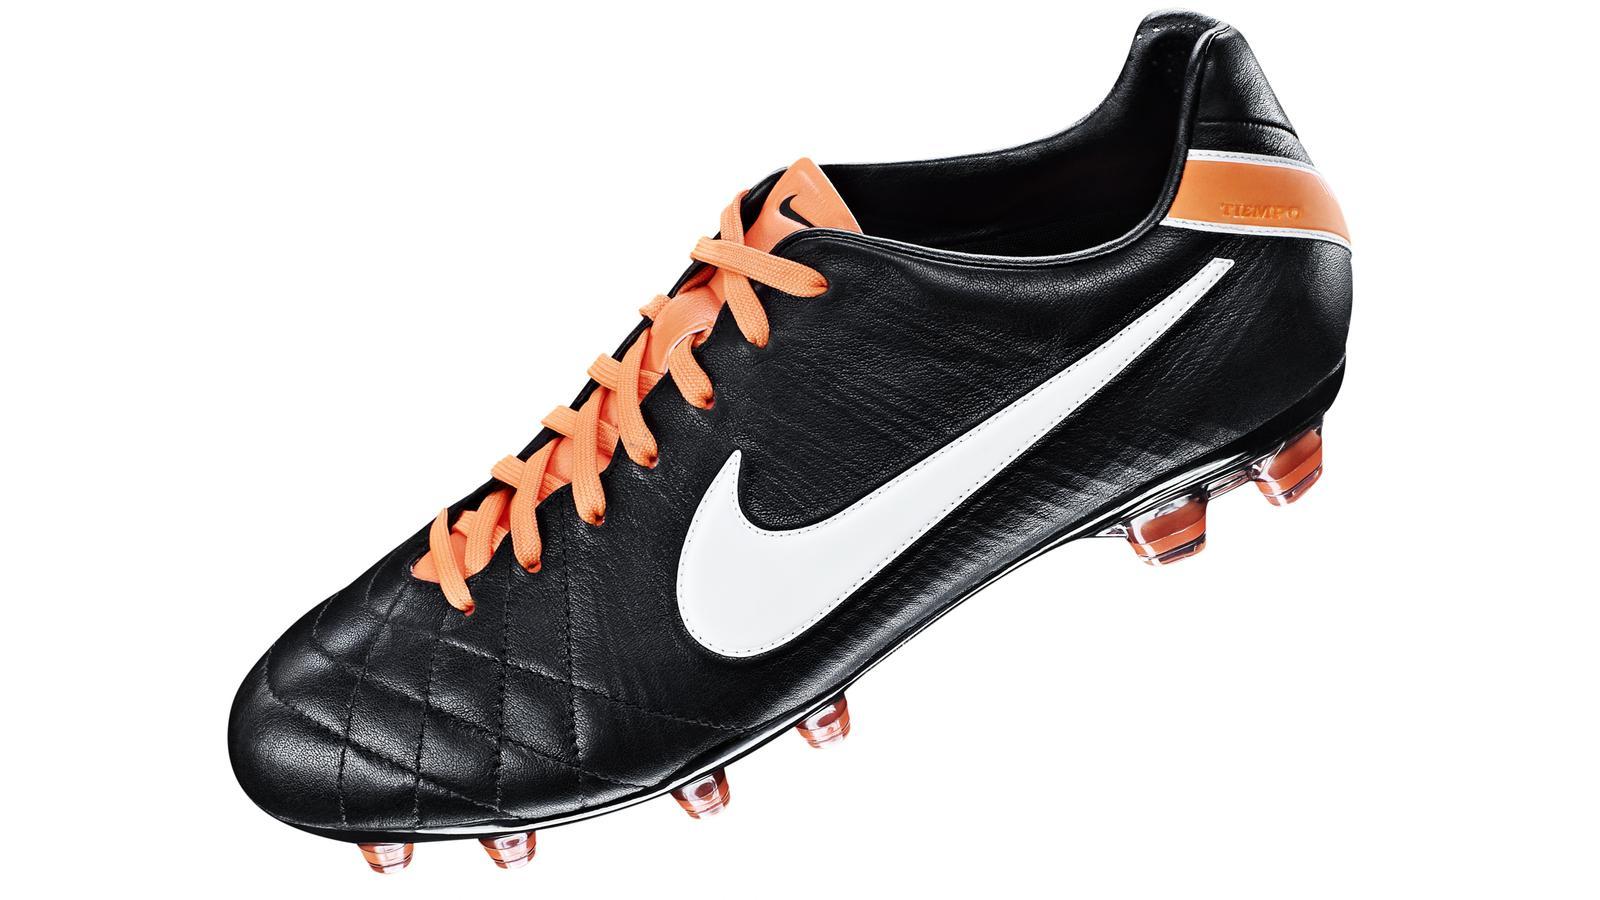 buy popular 12a5c bfbf5 A Legend Reborn - Tiempo Legend IV Elite - Nike News